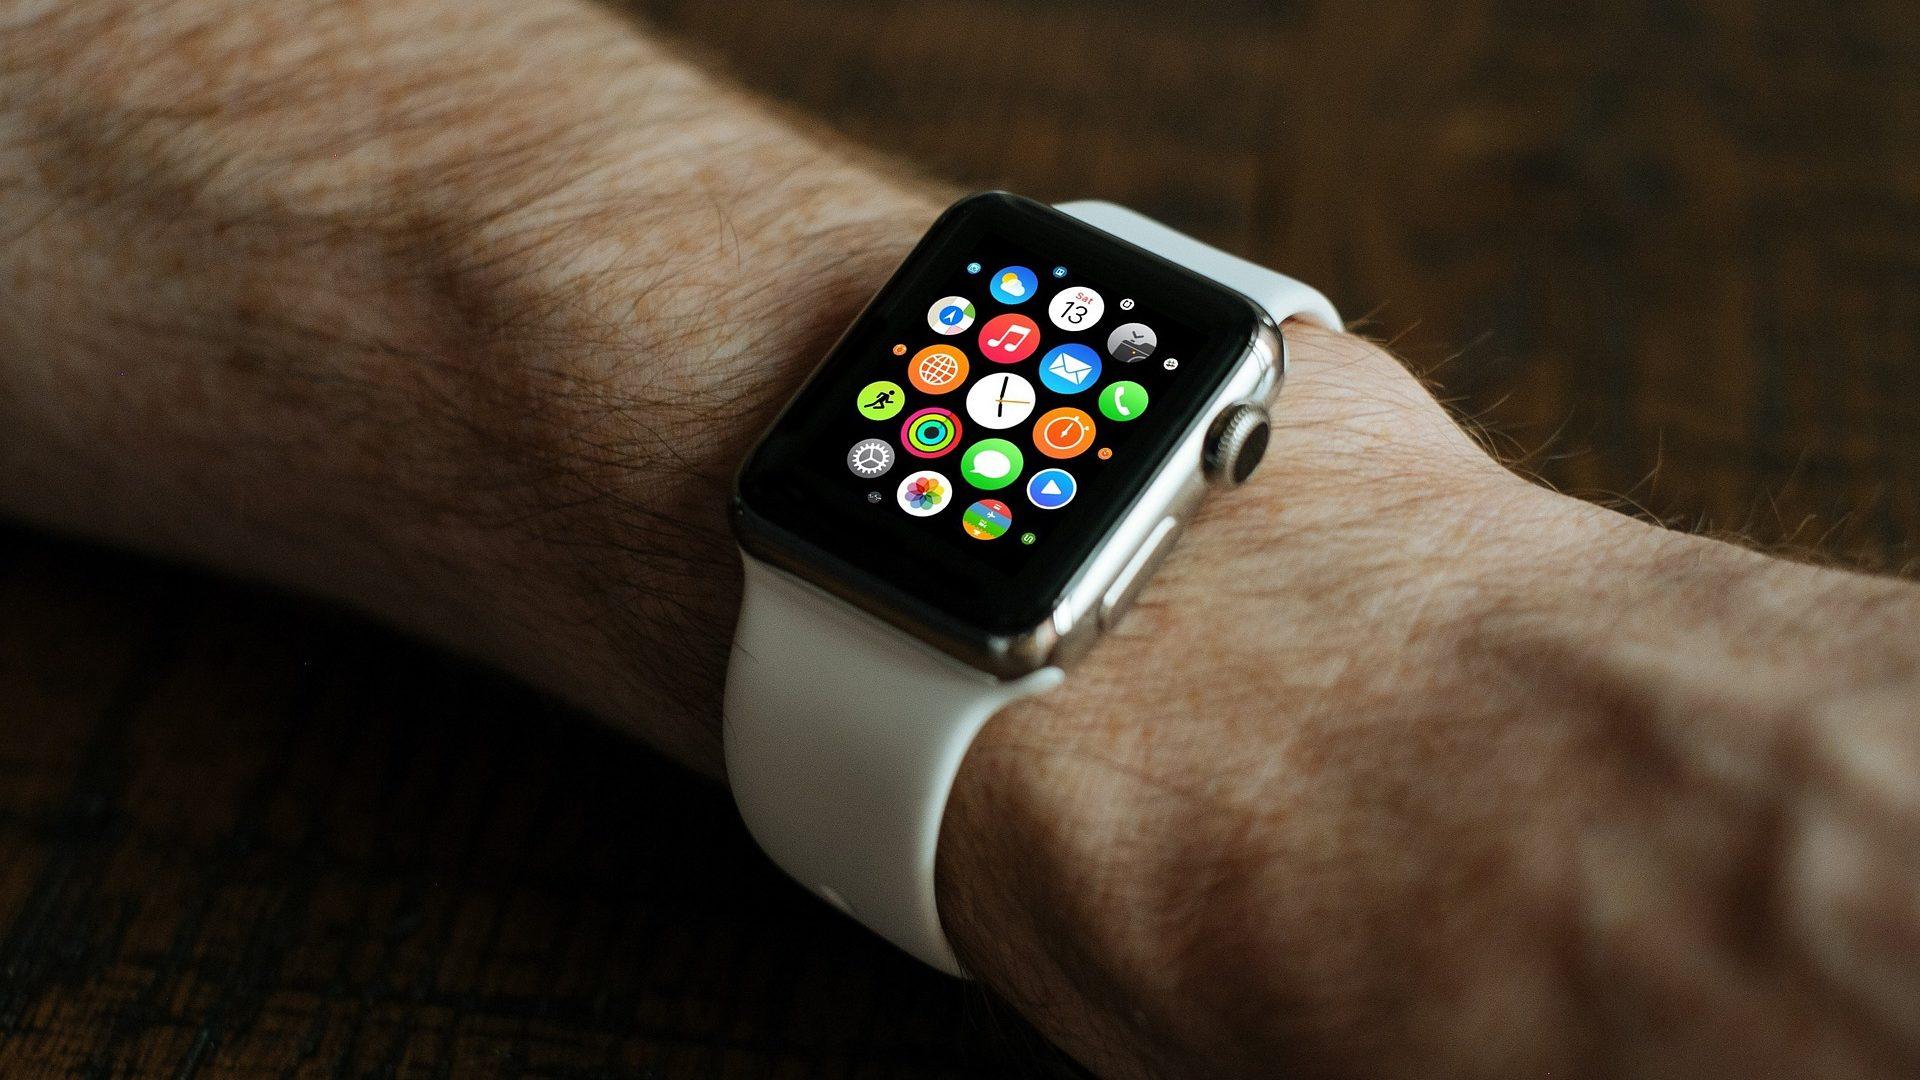 smart-watch-821559_1920 (1)